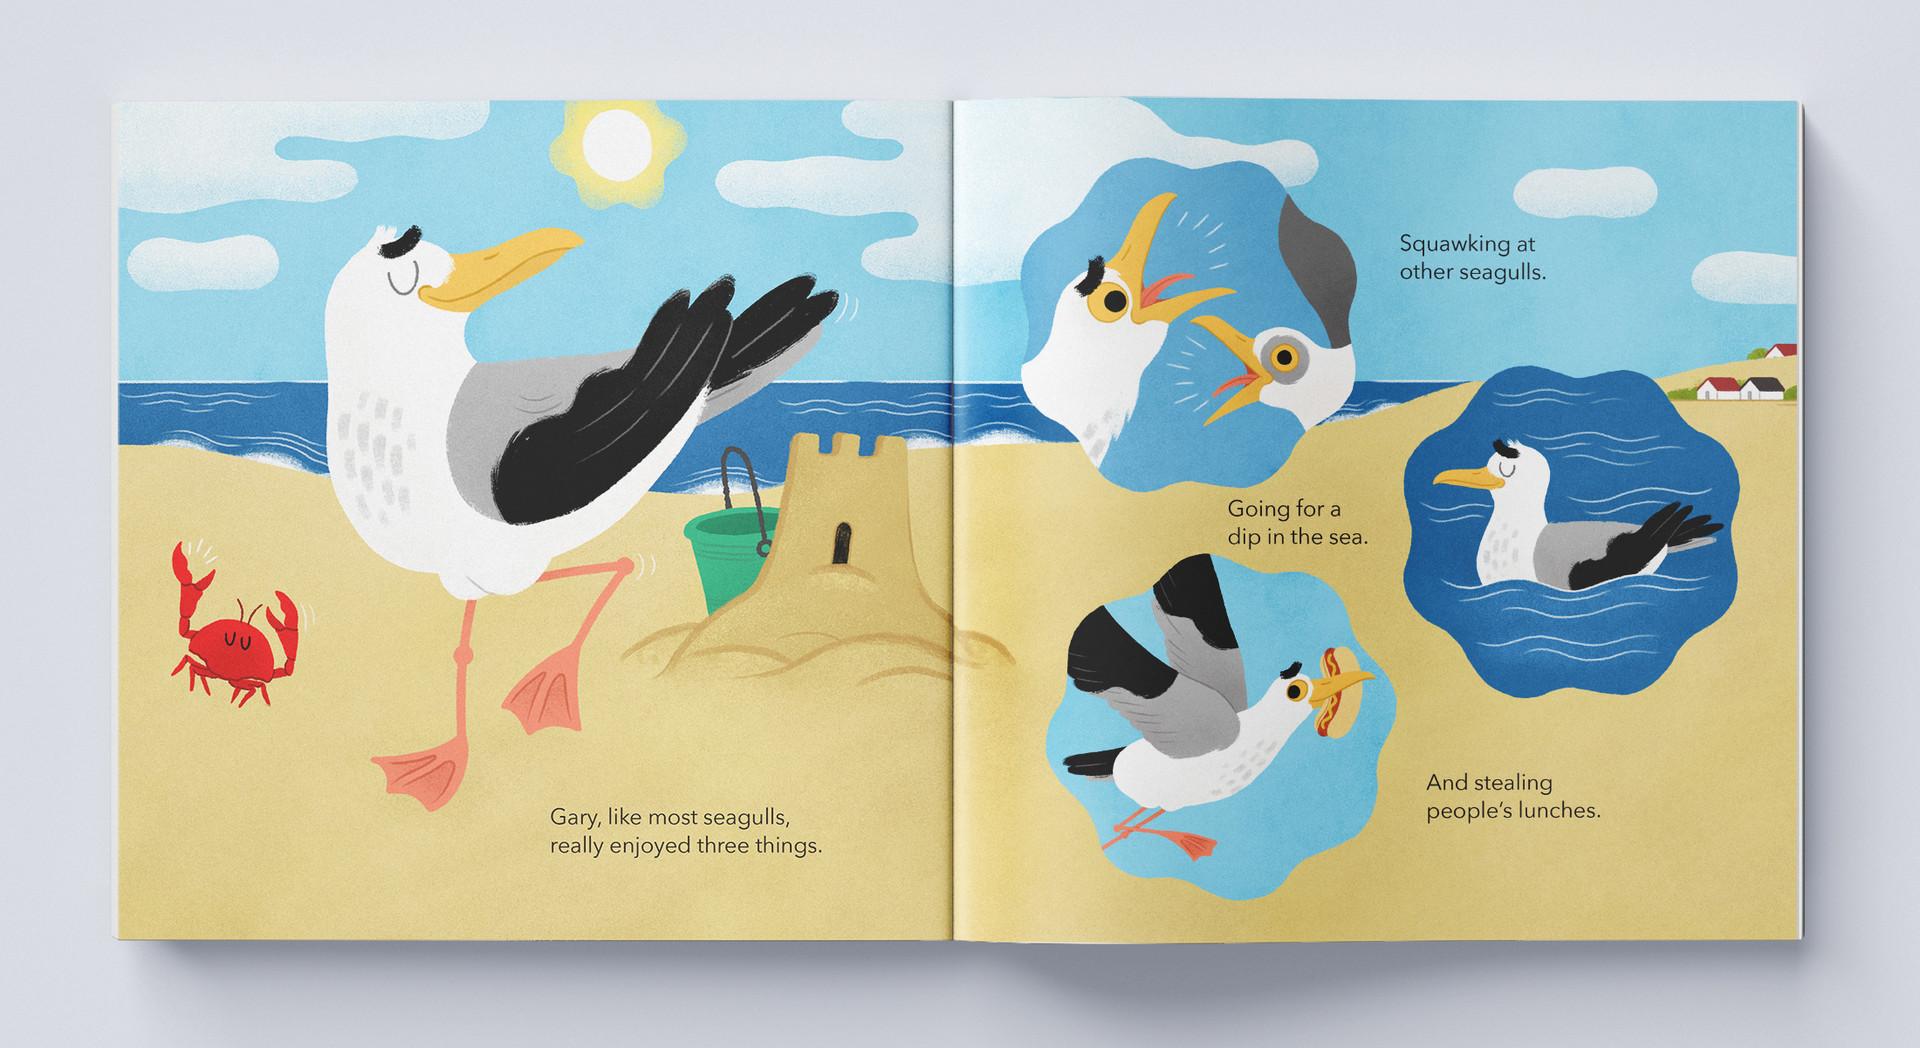 Gary The Seagull interior 01